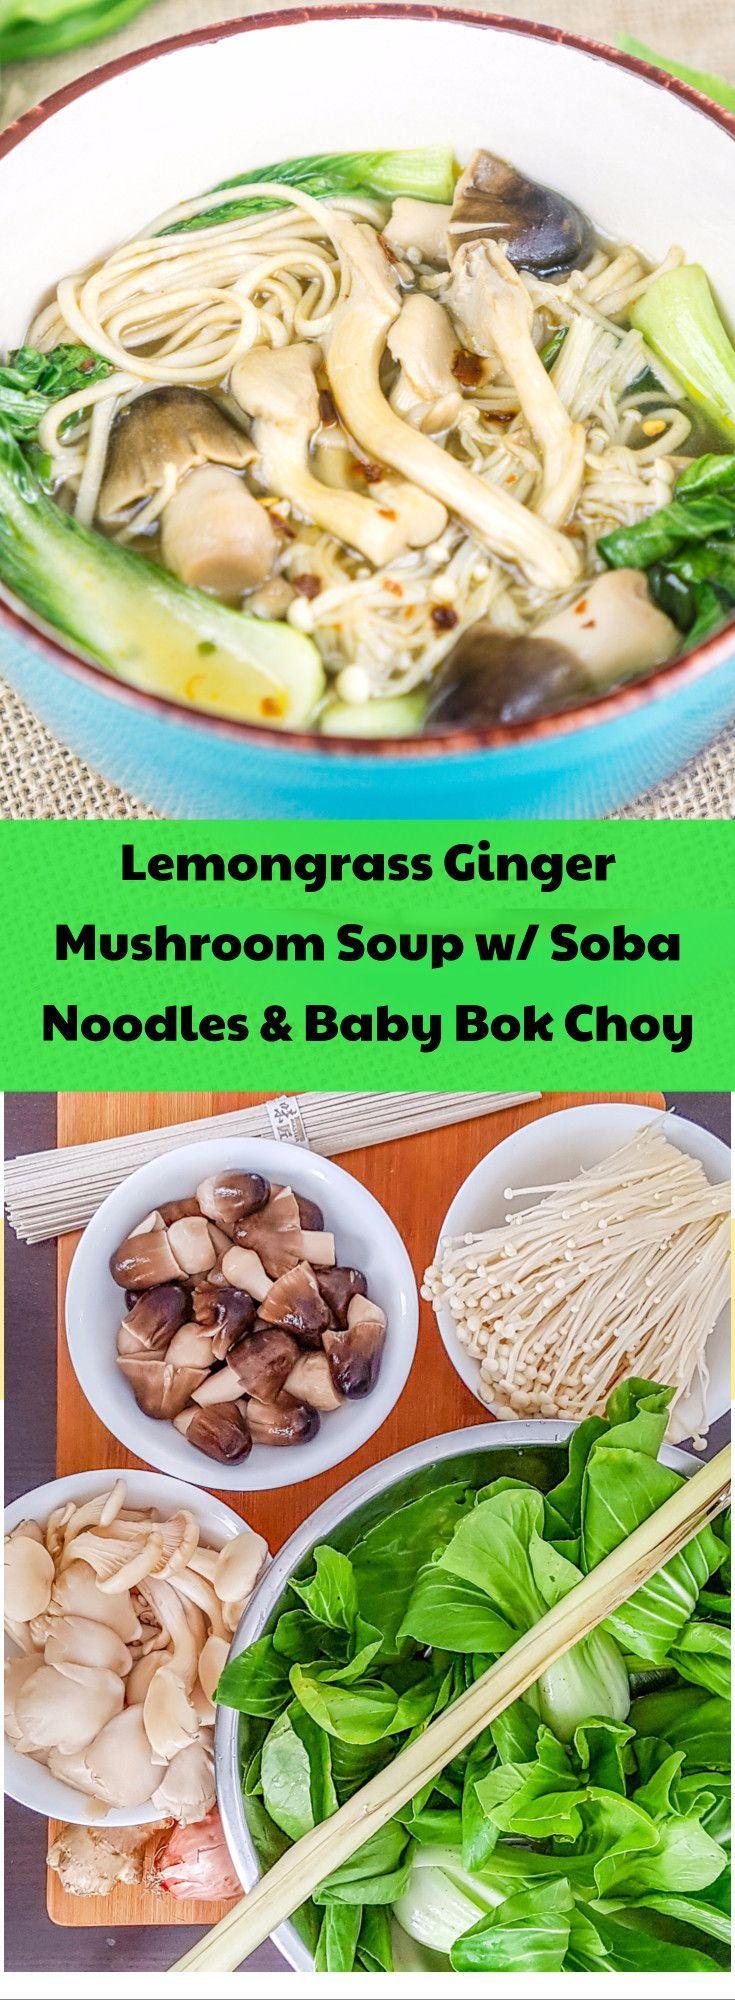 Lemongrass Ginger Mushroom Soup with Soba Noodles and Baby Bok Choy - babaganosh.org #vegan #vegetarian #soup #comfortfood #lemongrass #ginger #mushrooms #mushroomsoup #enoki